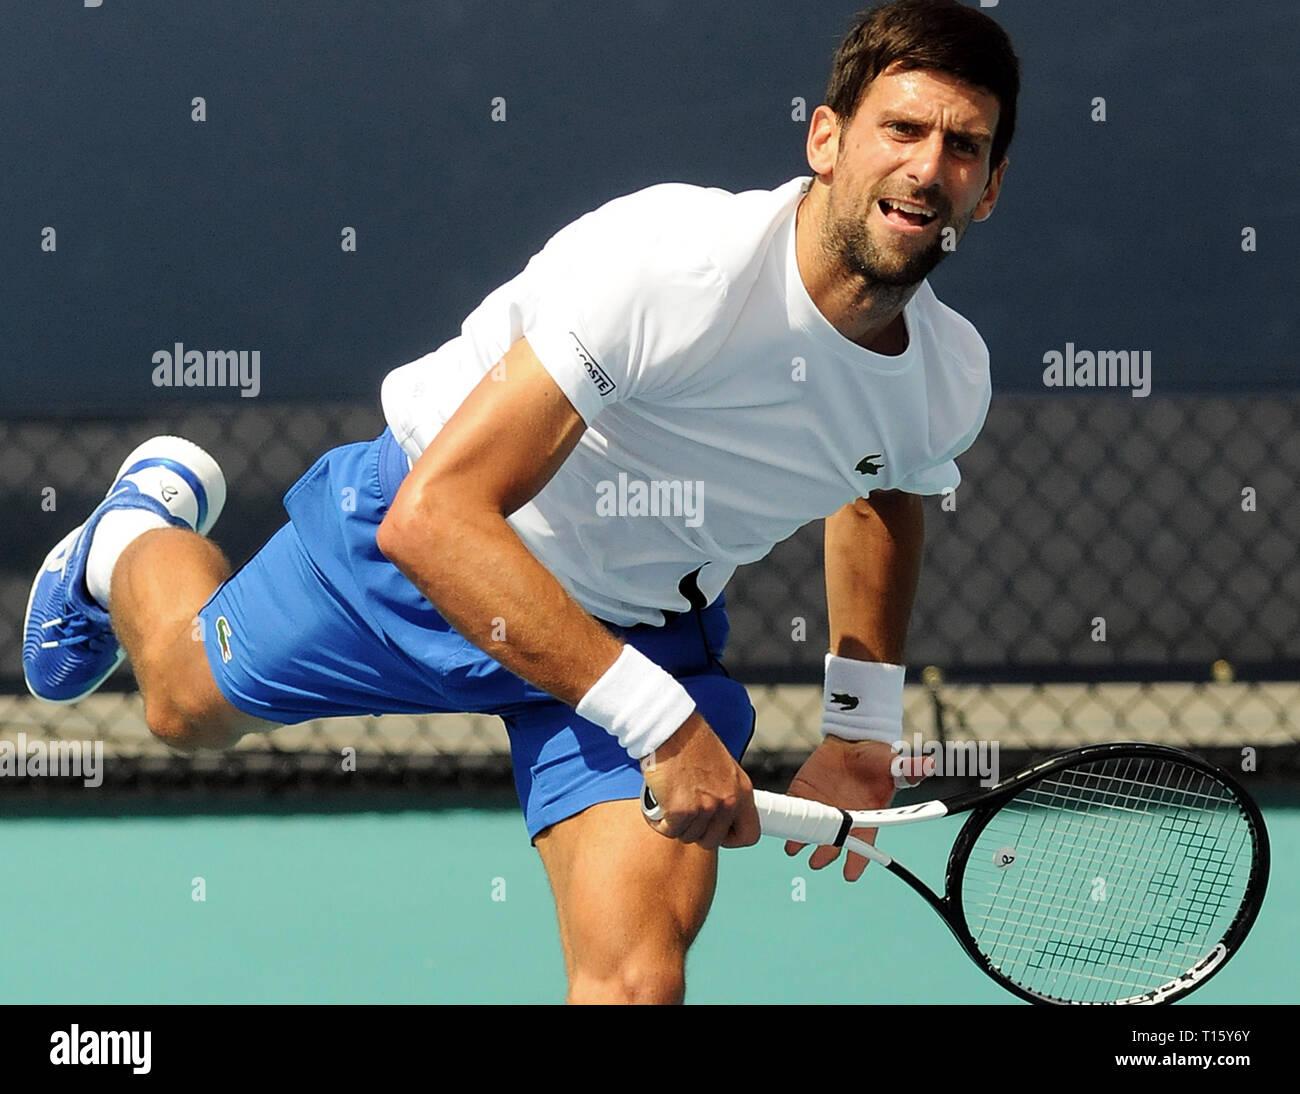 6ea399b45b Novak Djokovic Racket Stock Photos & Novak Djokovic Racket Stock ...